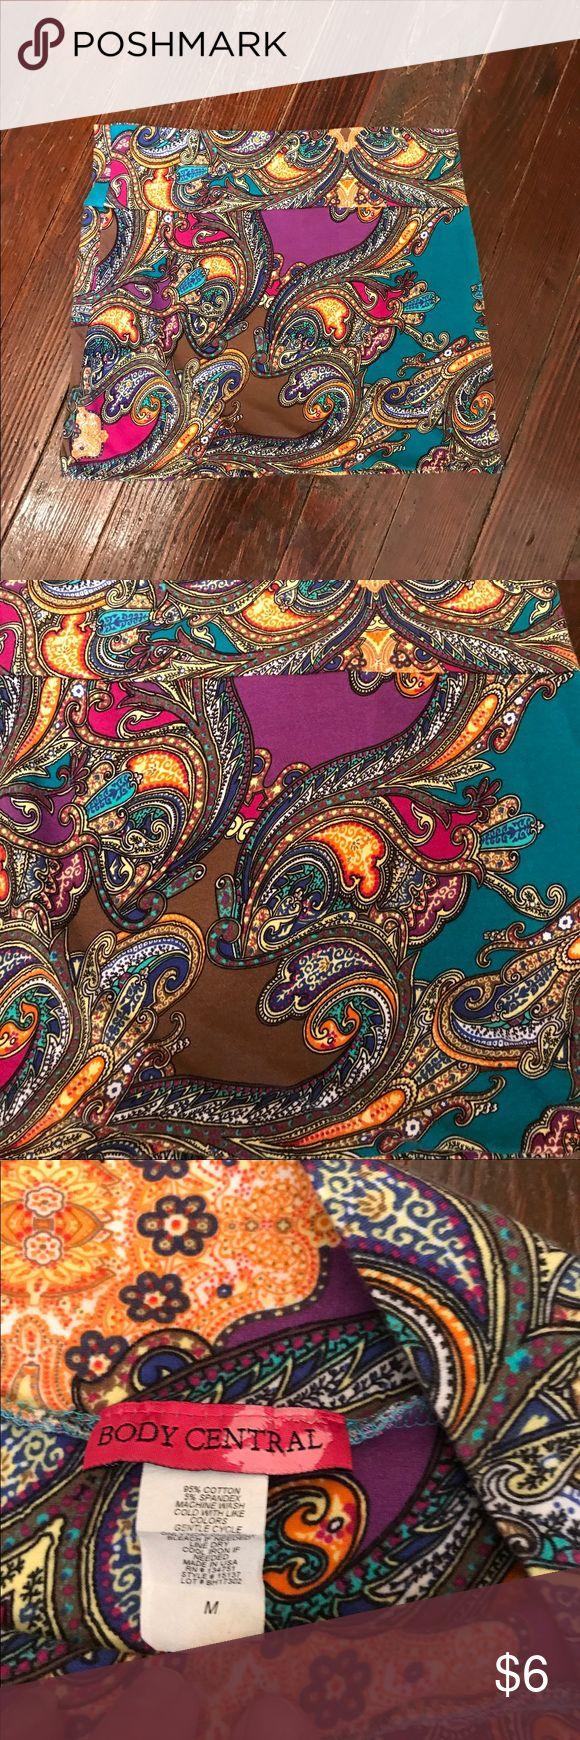 "Body Central Mini Skirt Super soft fabric.  Length 14"".  Looks brand new Skirts Mini"